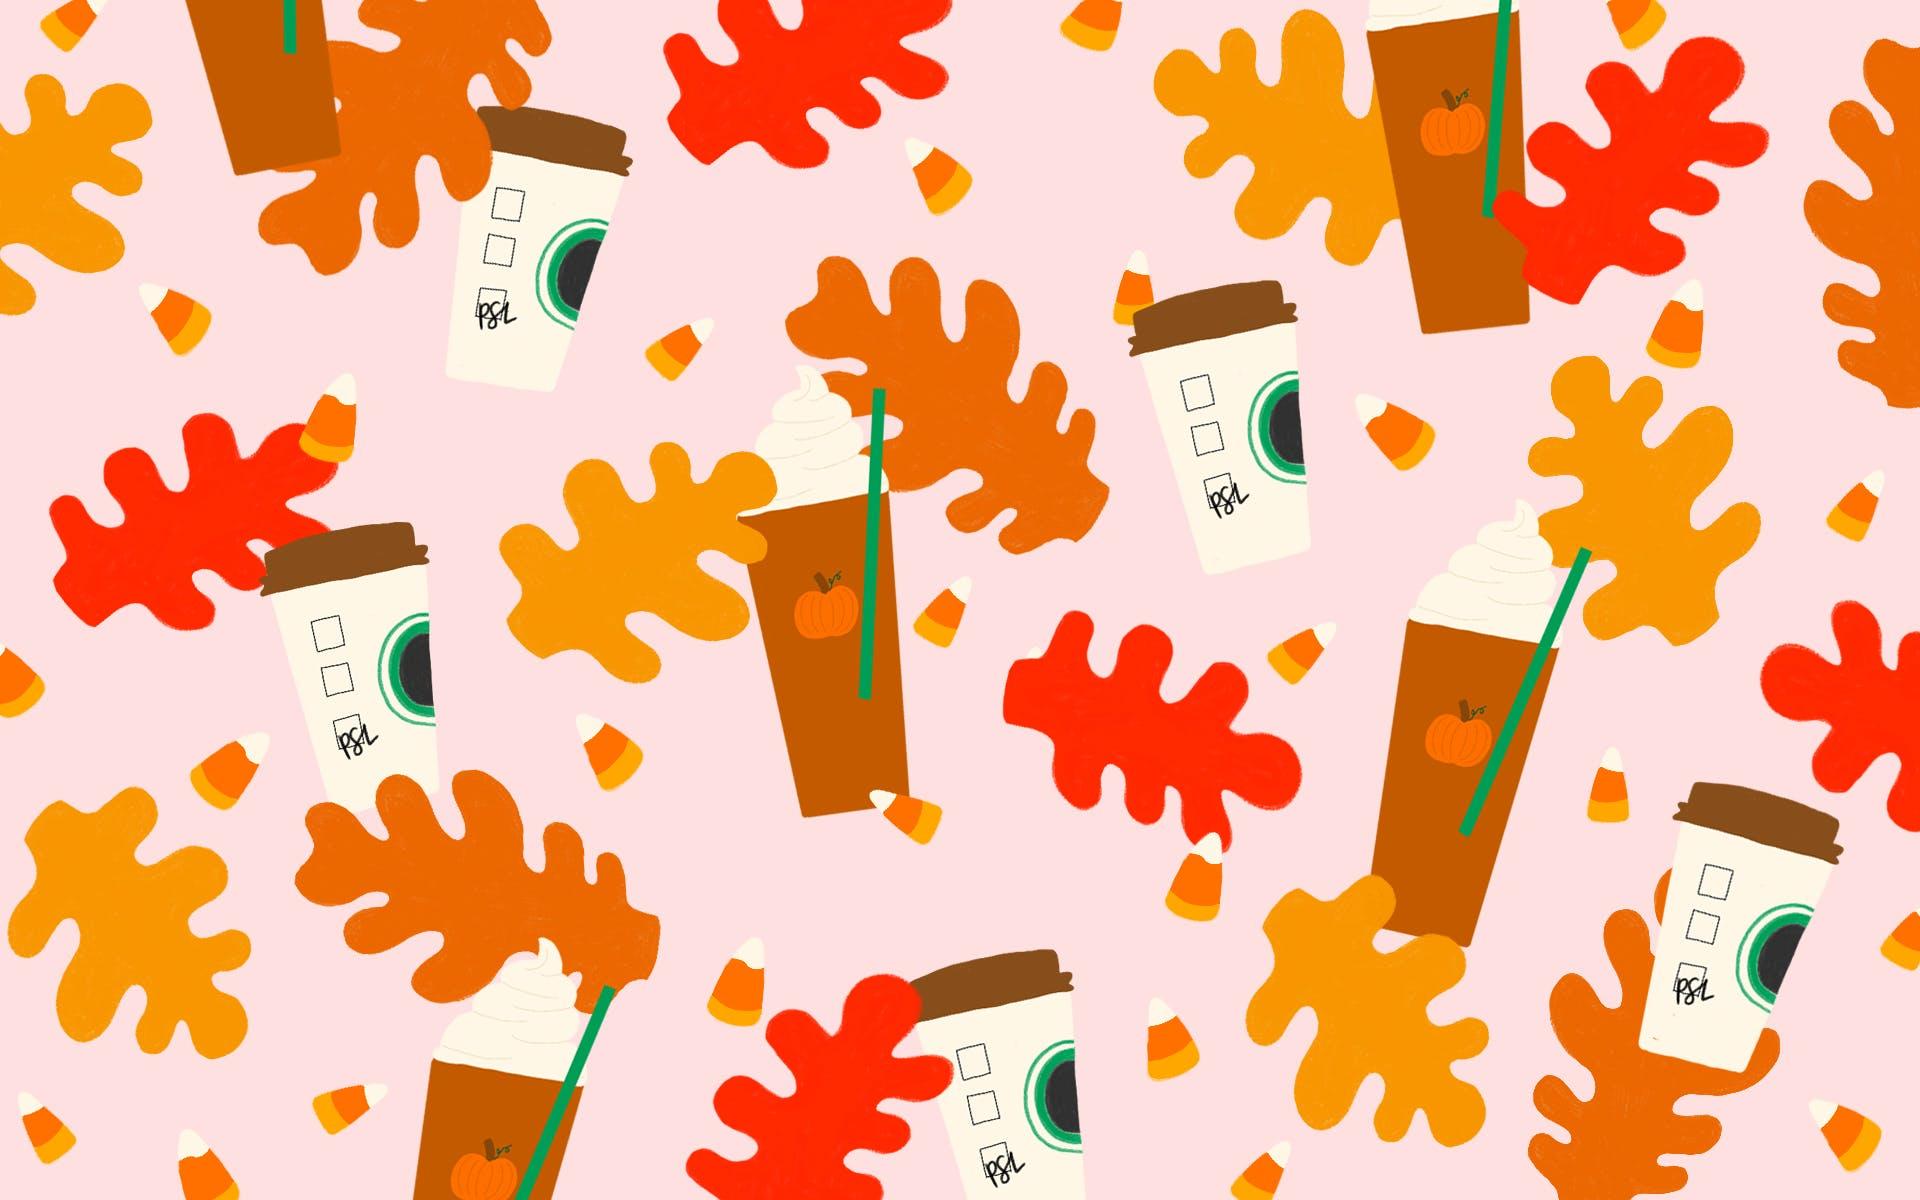 42 Psl Wallpaper On Wallpapersafari